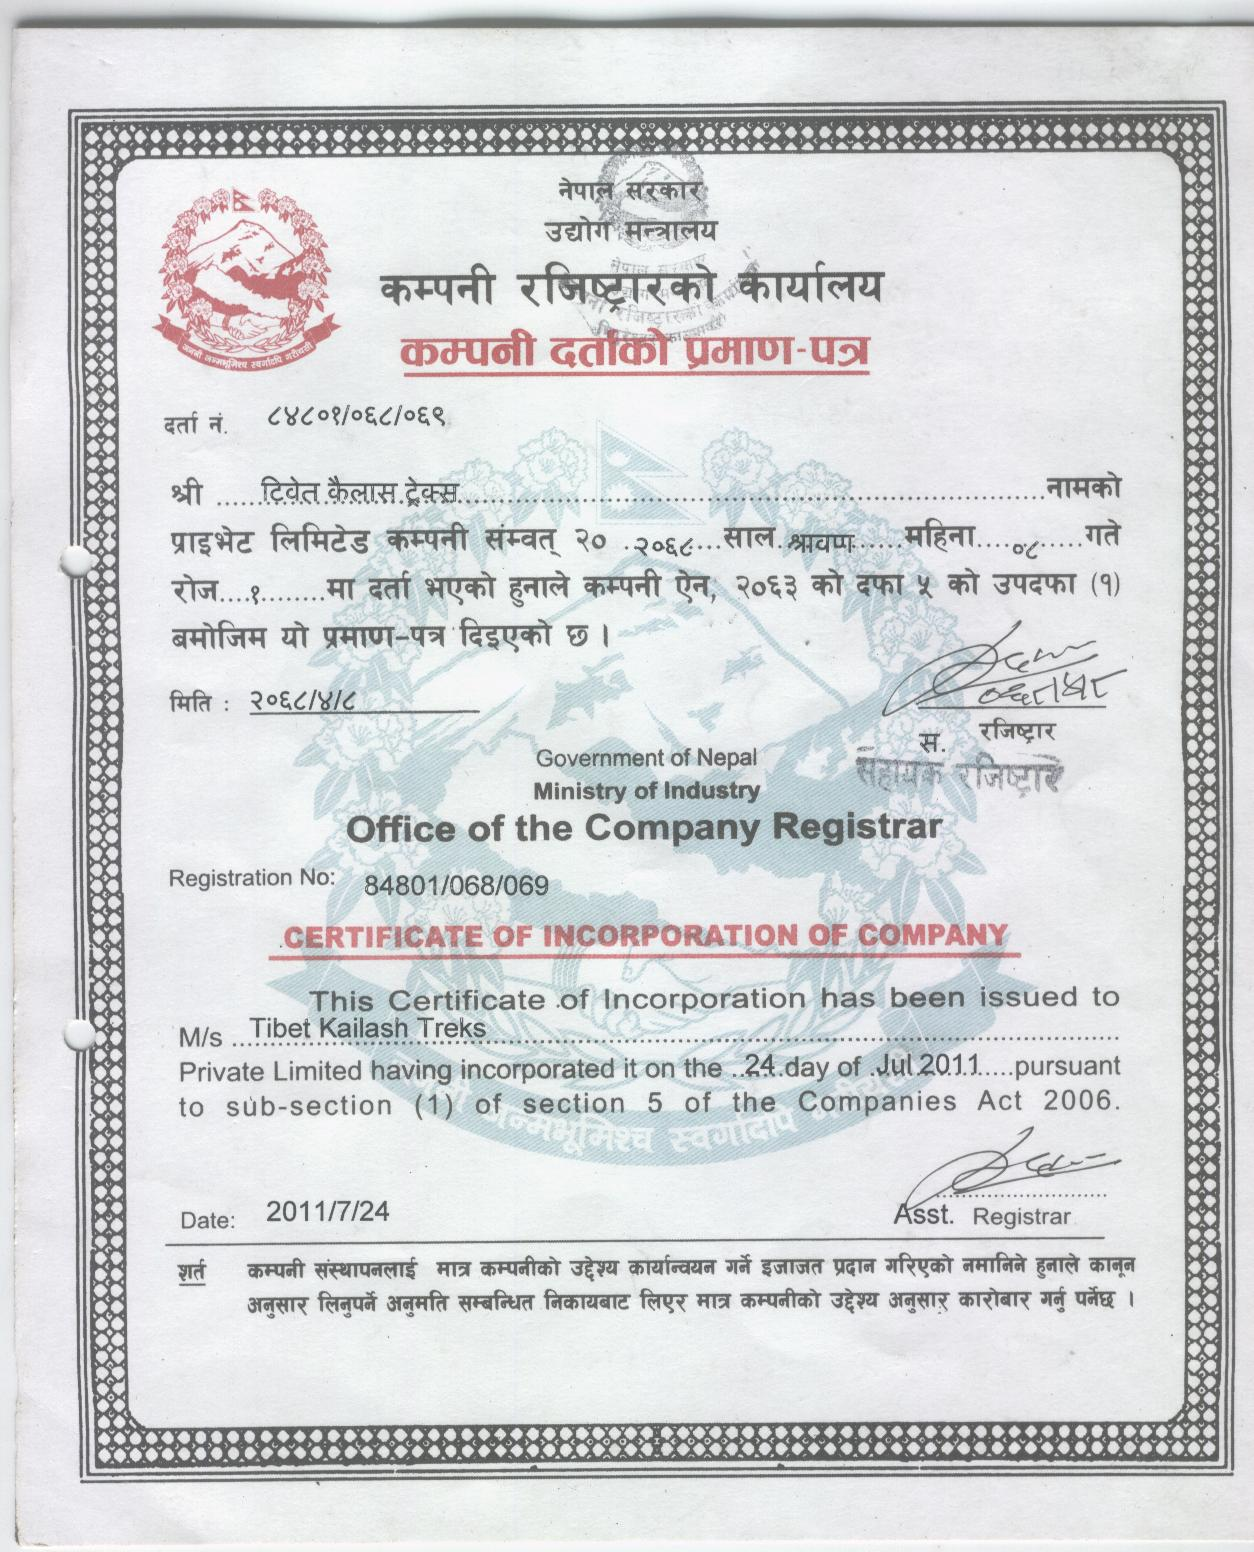 company-registration-certificate.jpg